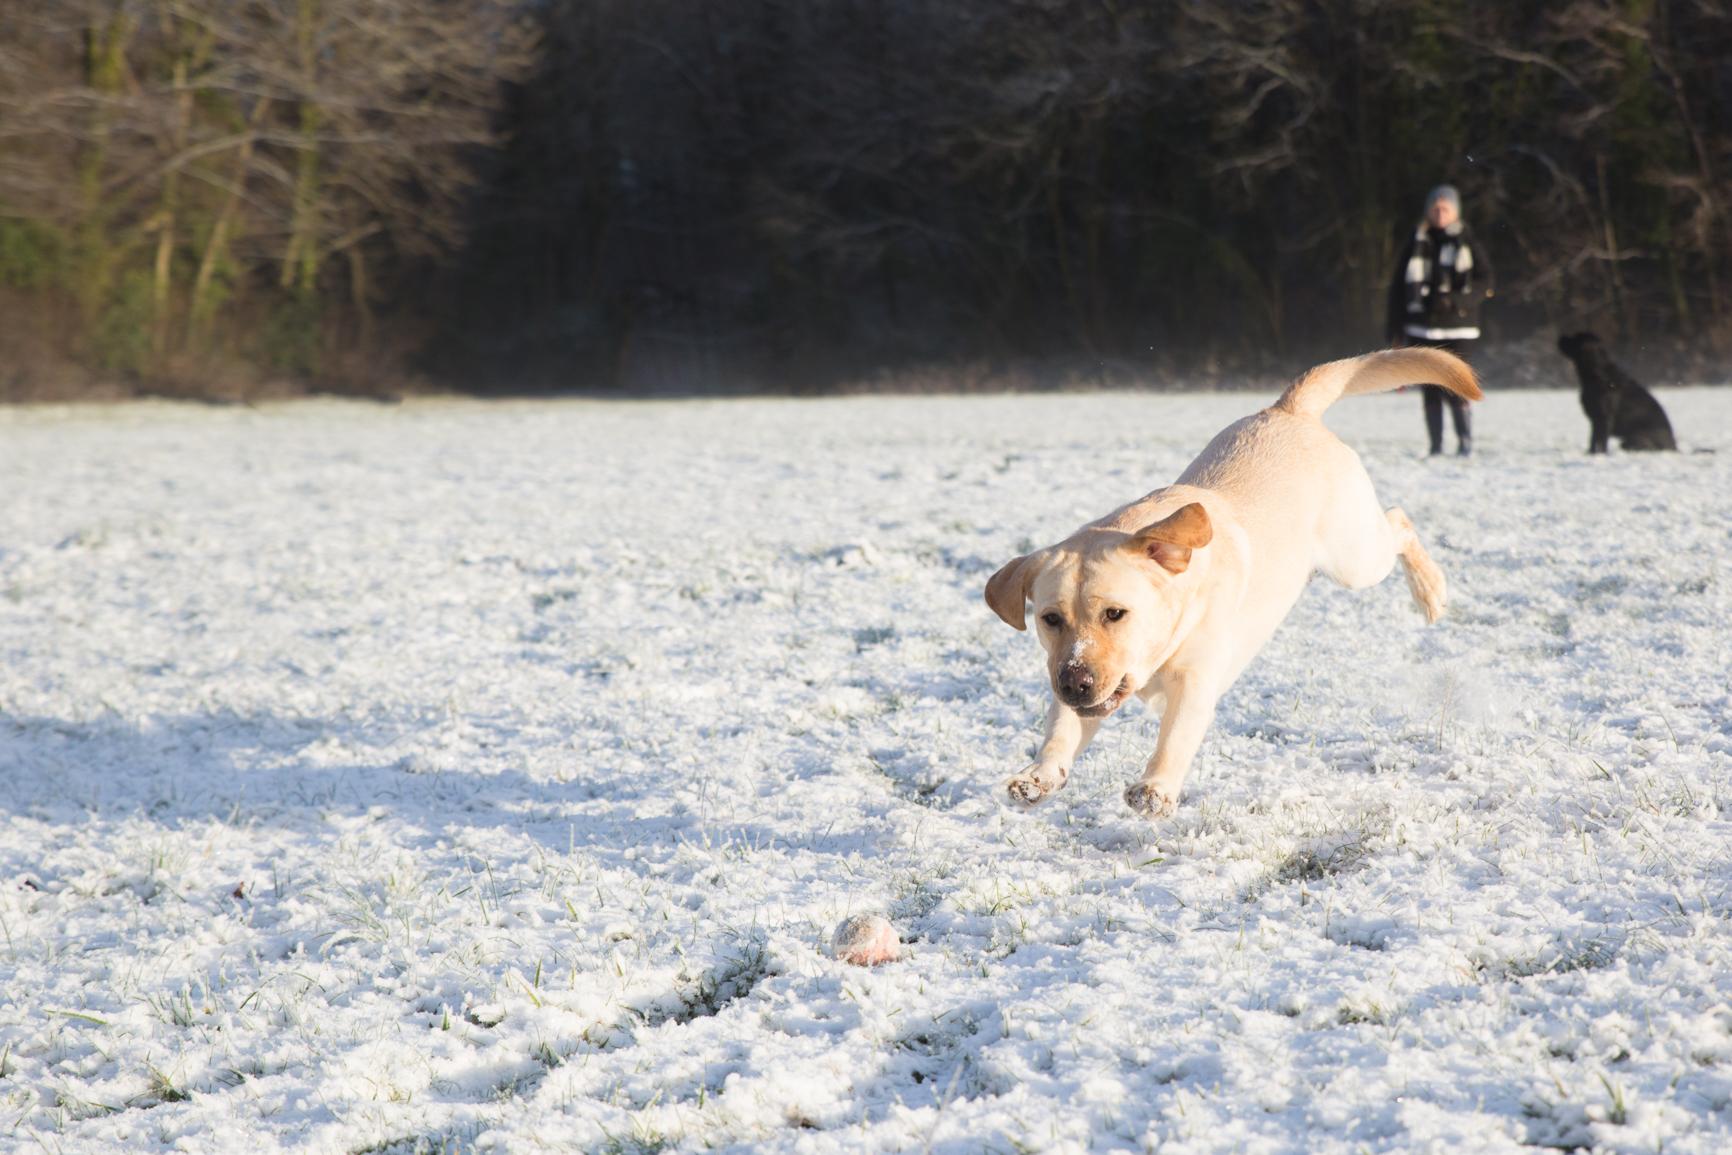 Yellow Labrador enjoying the snow. Photograph by Nia & James The Photographers.